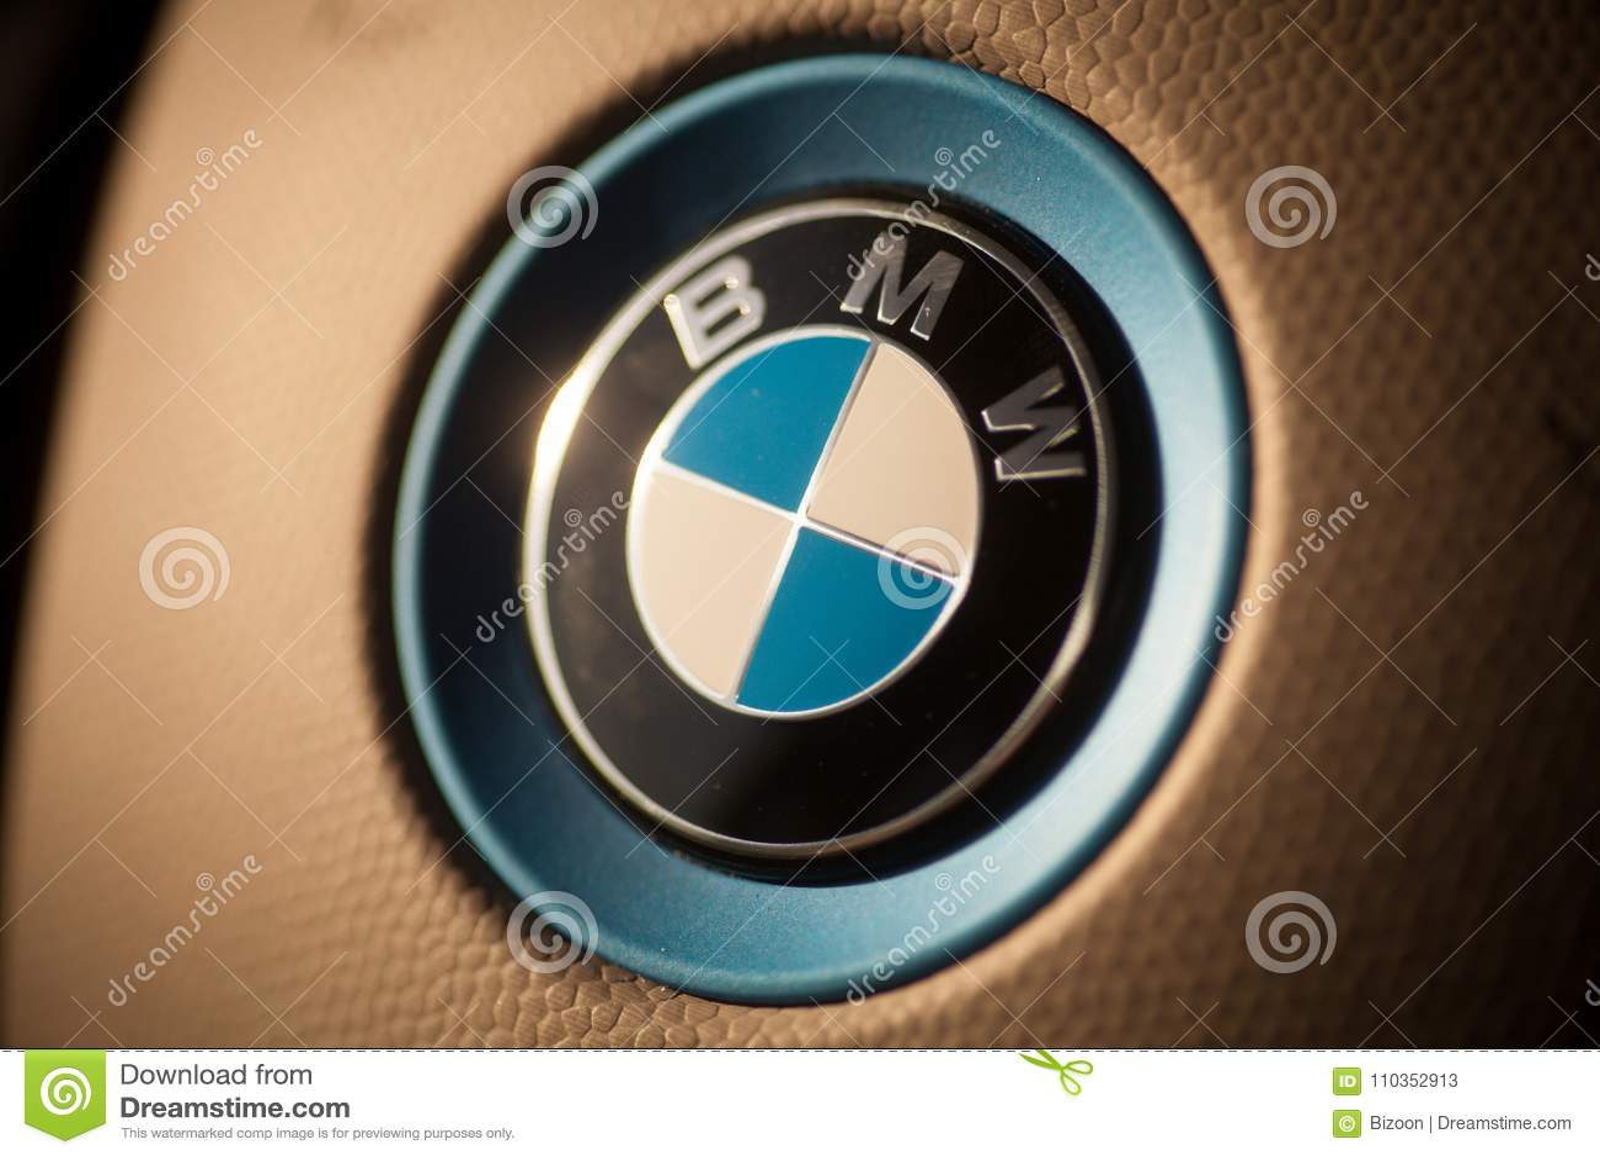 BMW car logo detail editorial stock photo. Image of modern ... - photo#17